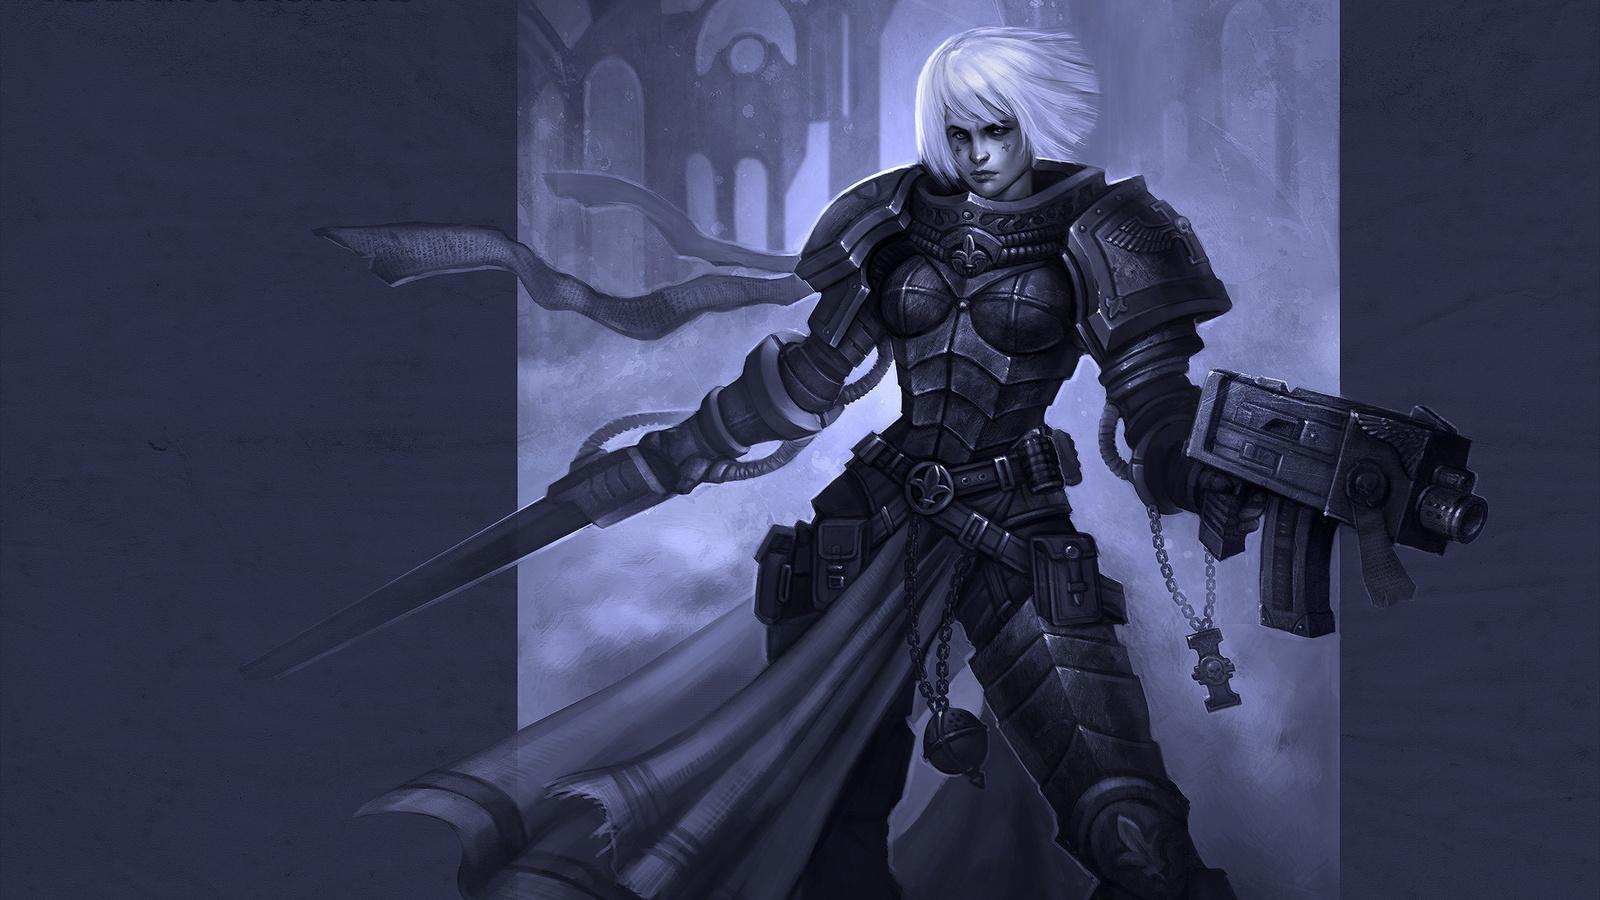 warhammer 40k, сёстры битвы, силовой, adepta sororitas, First-keeper